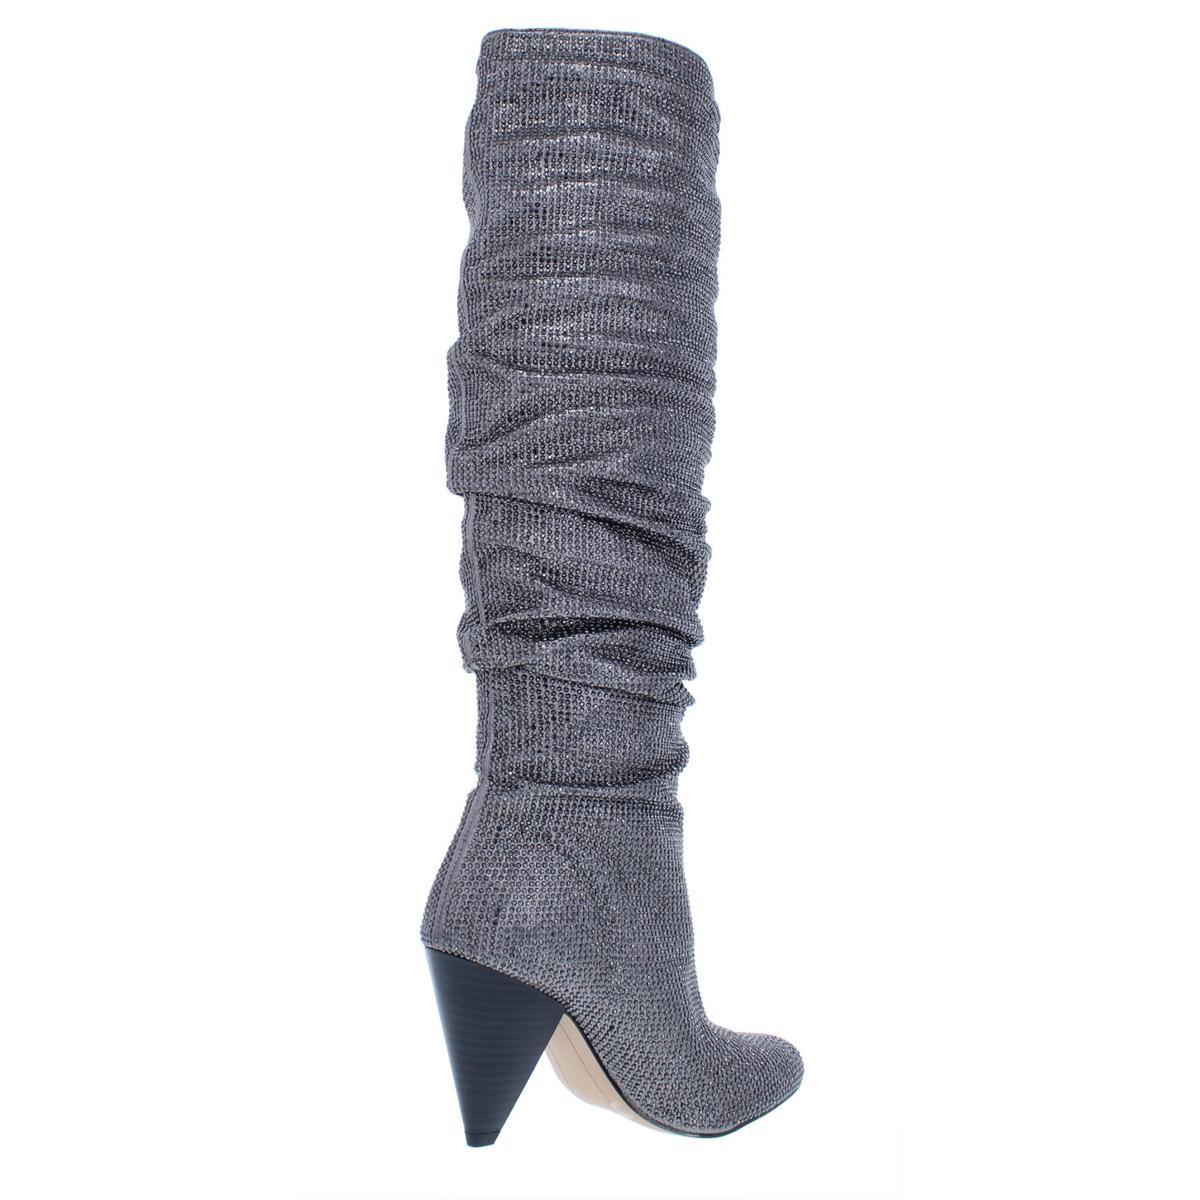 INC Womens Gerii 3 Embellished Slouchy Fashion Knee-High Boots Shoes BHFO 0642